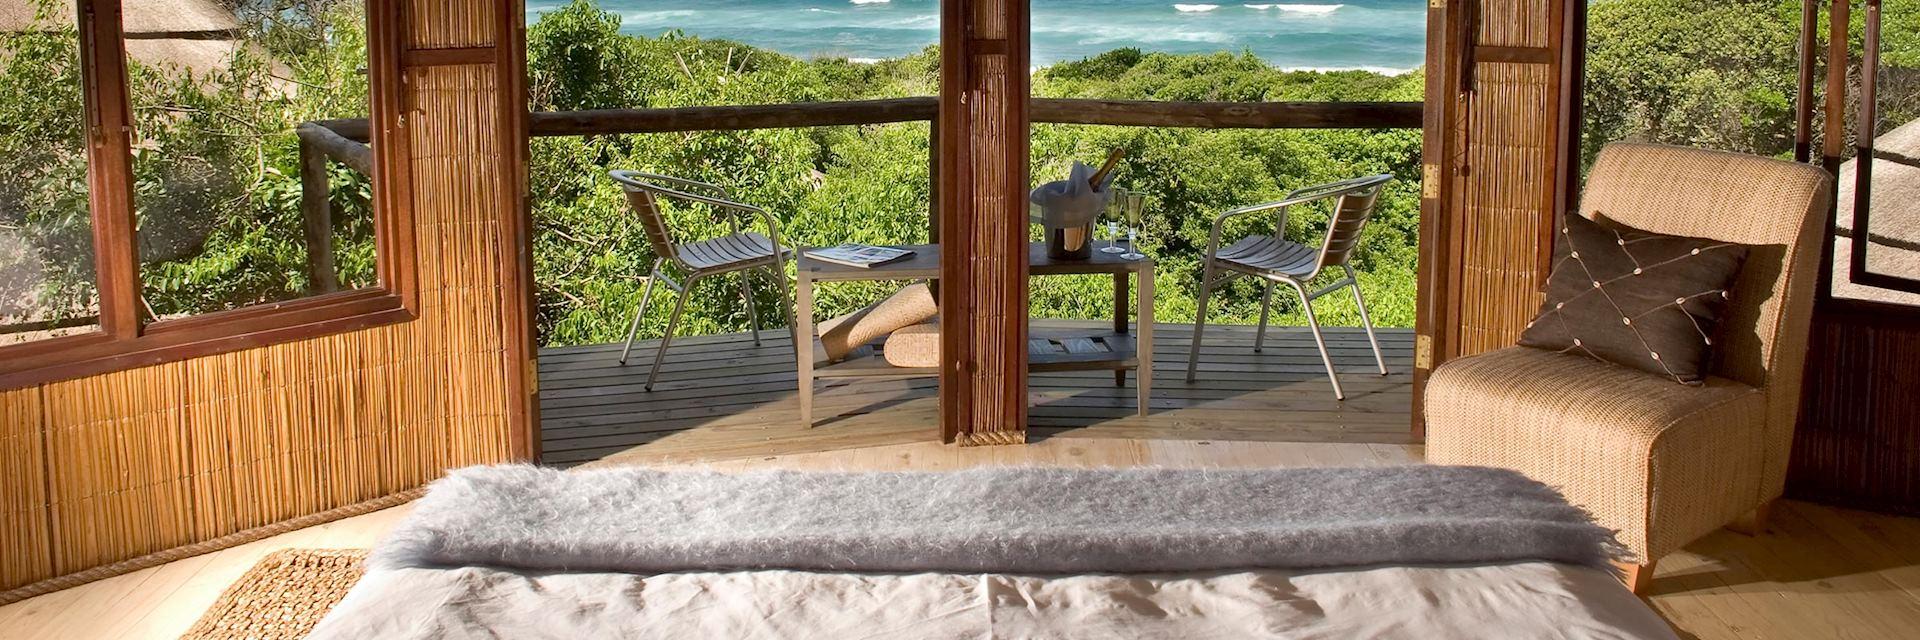 Thonga Beach Lodge, The Elephant Coast